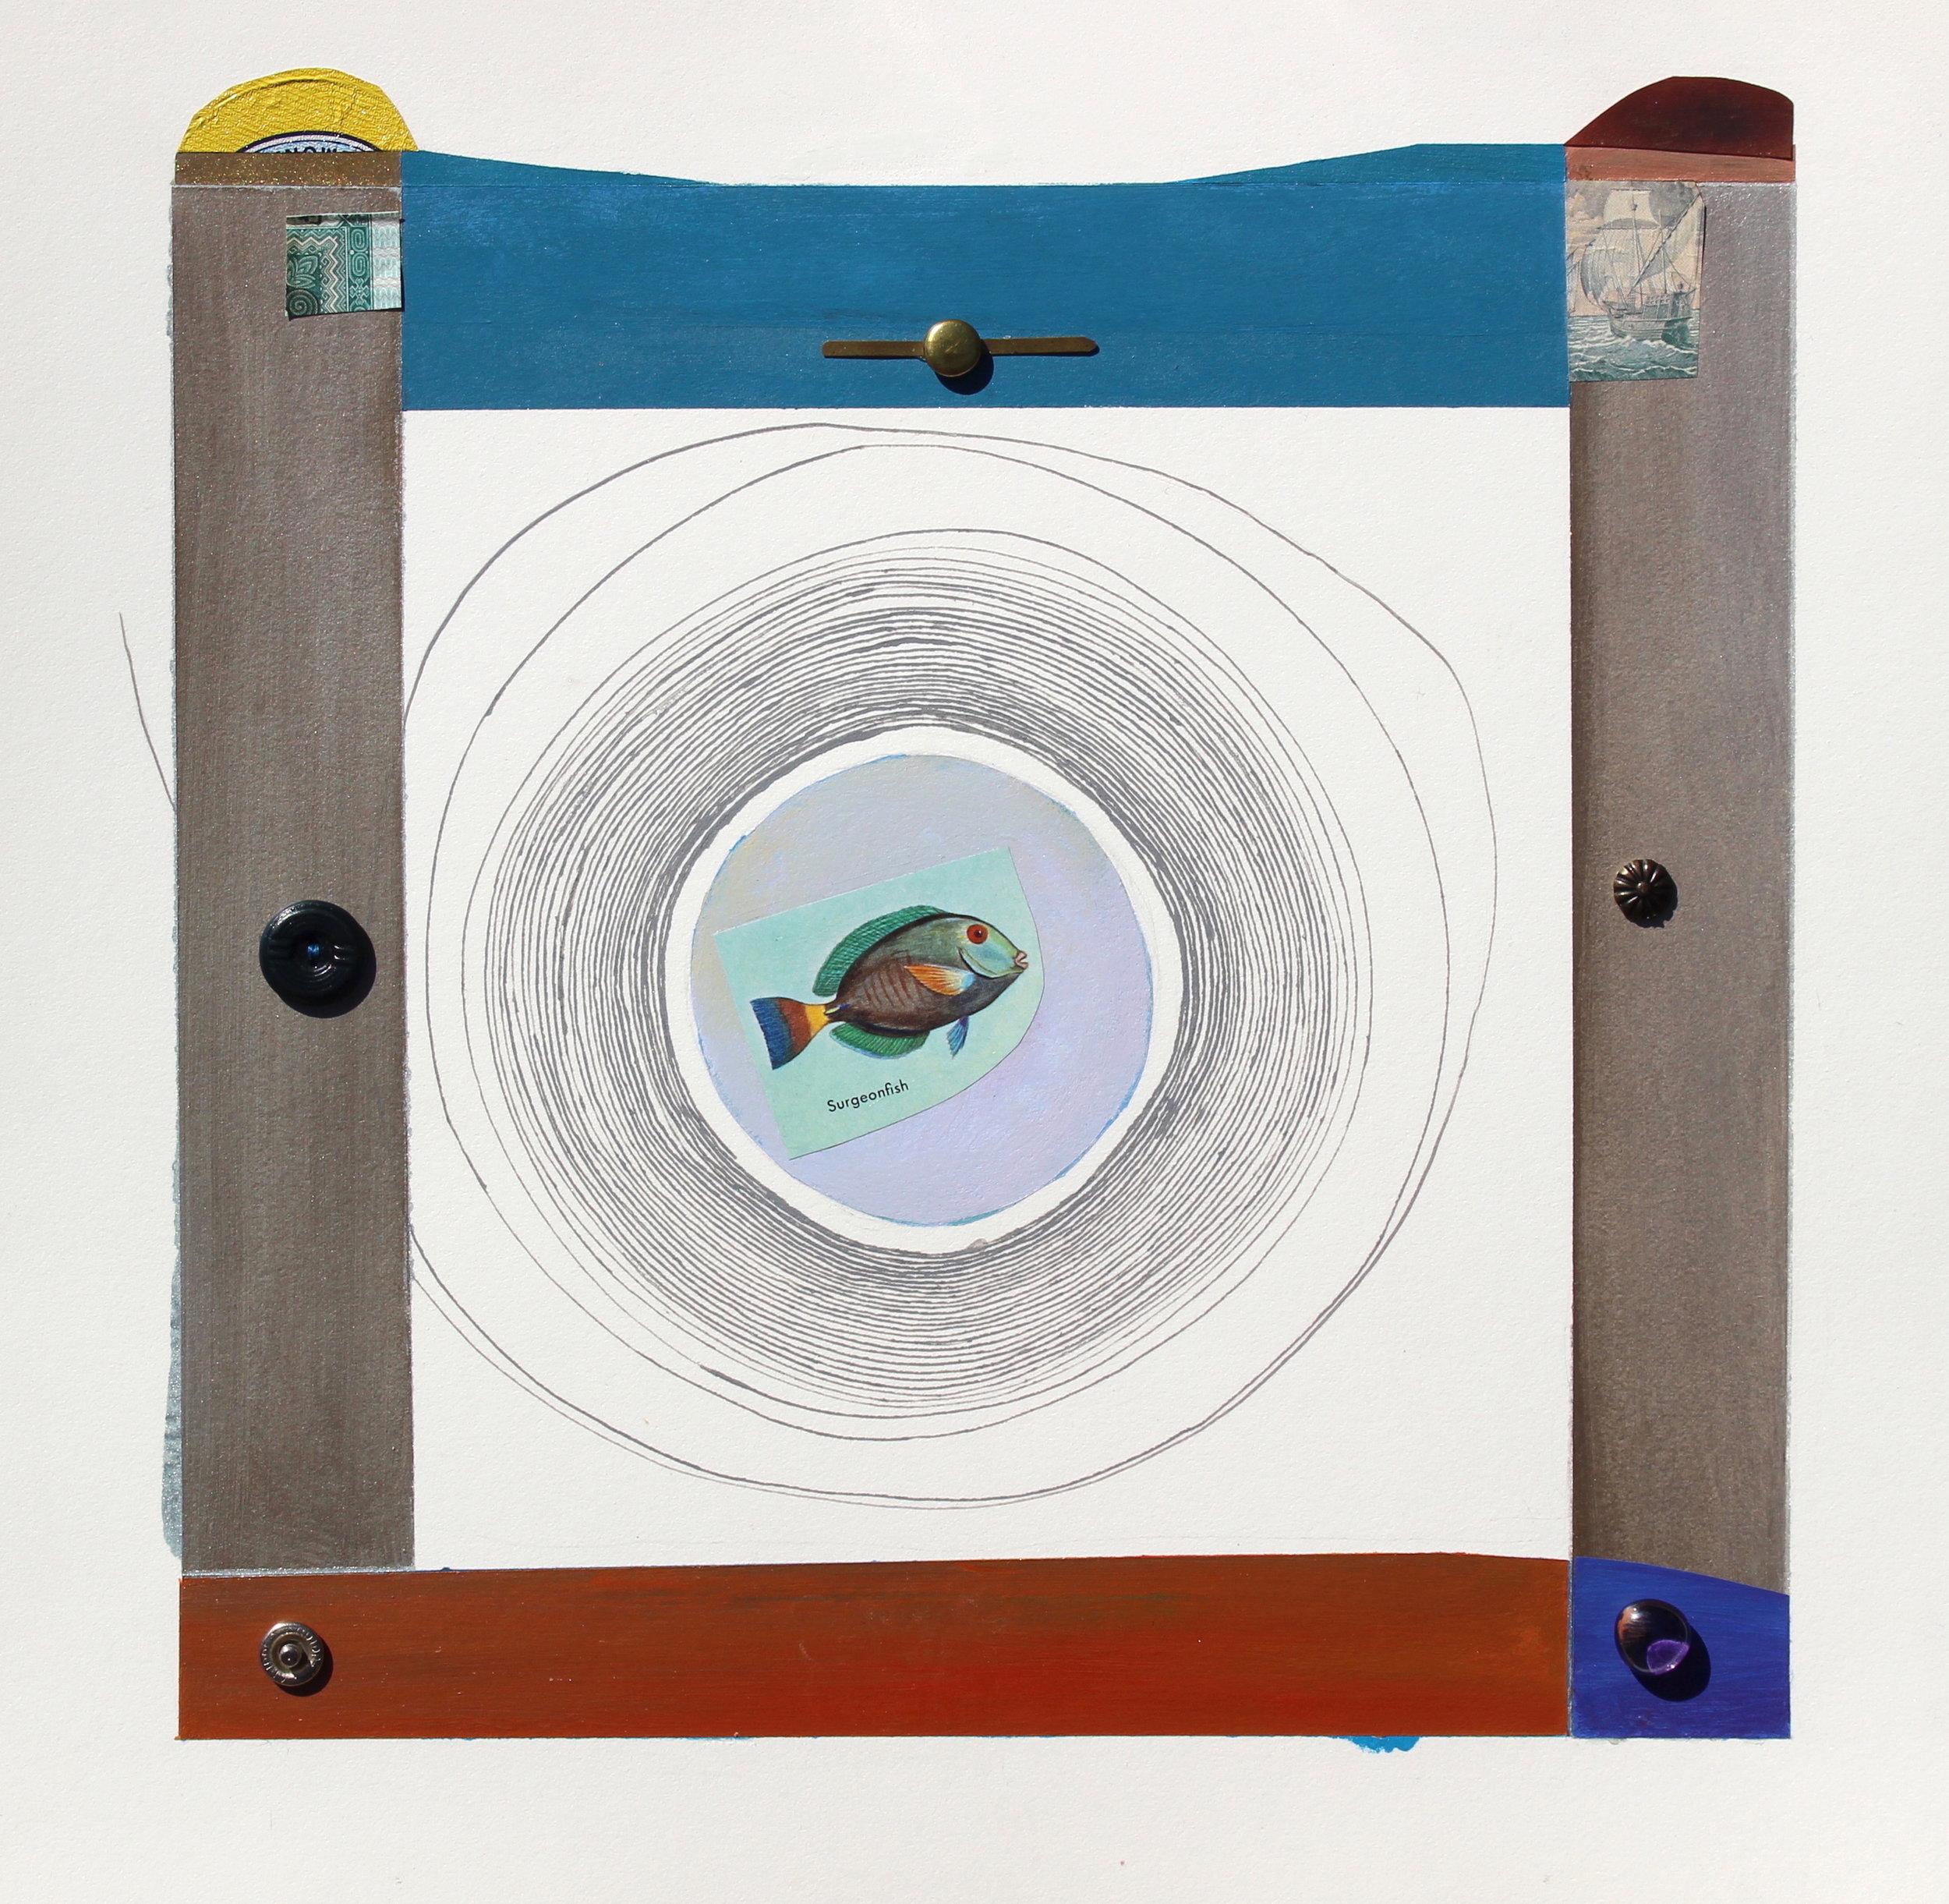 Moskowitz_Surgeonfish.jpg